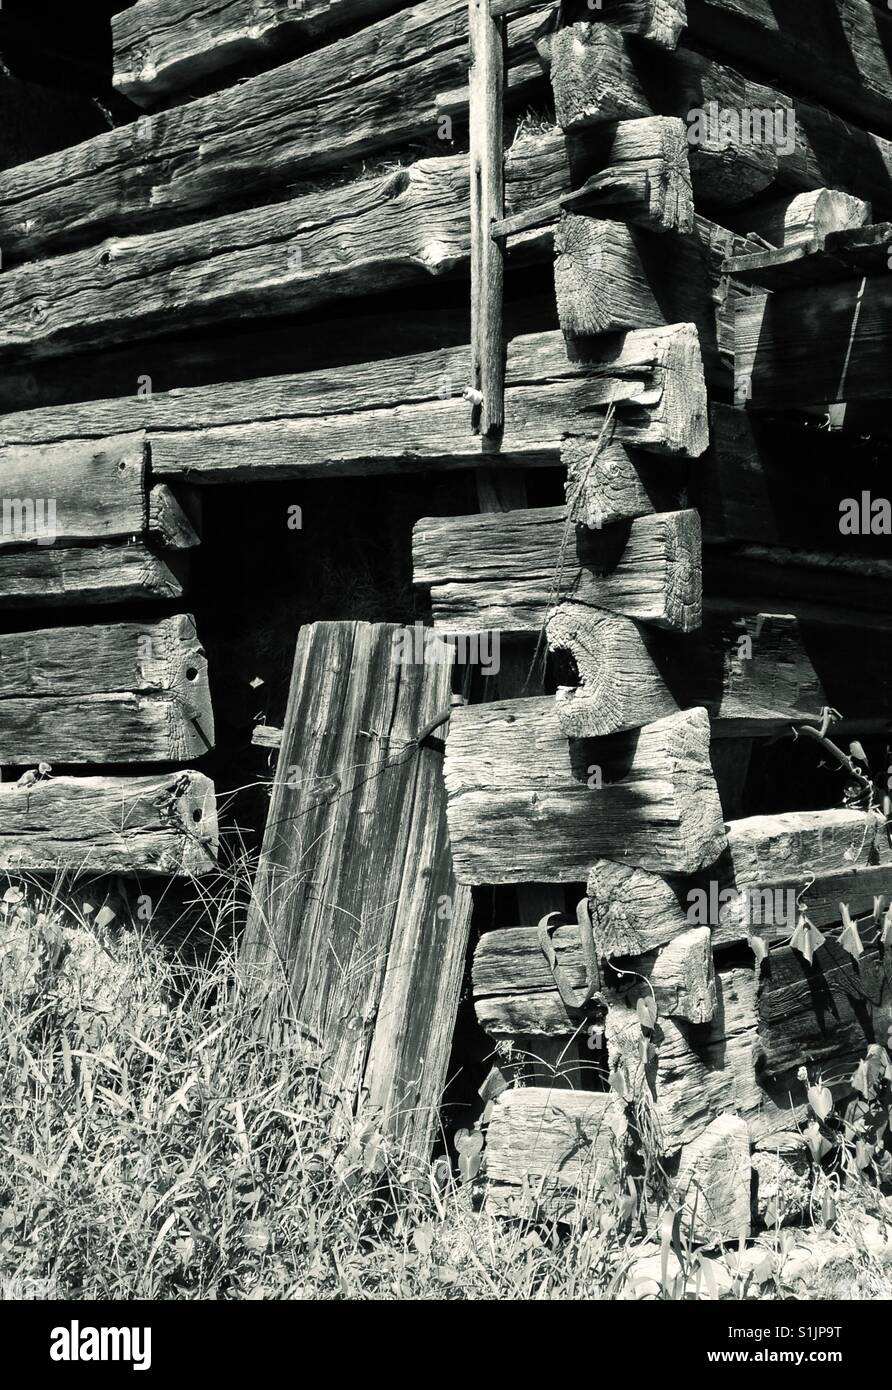 Timber Frame Barn Stockfotos & Timber Frame Barn Bilder - Alamy